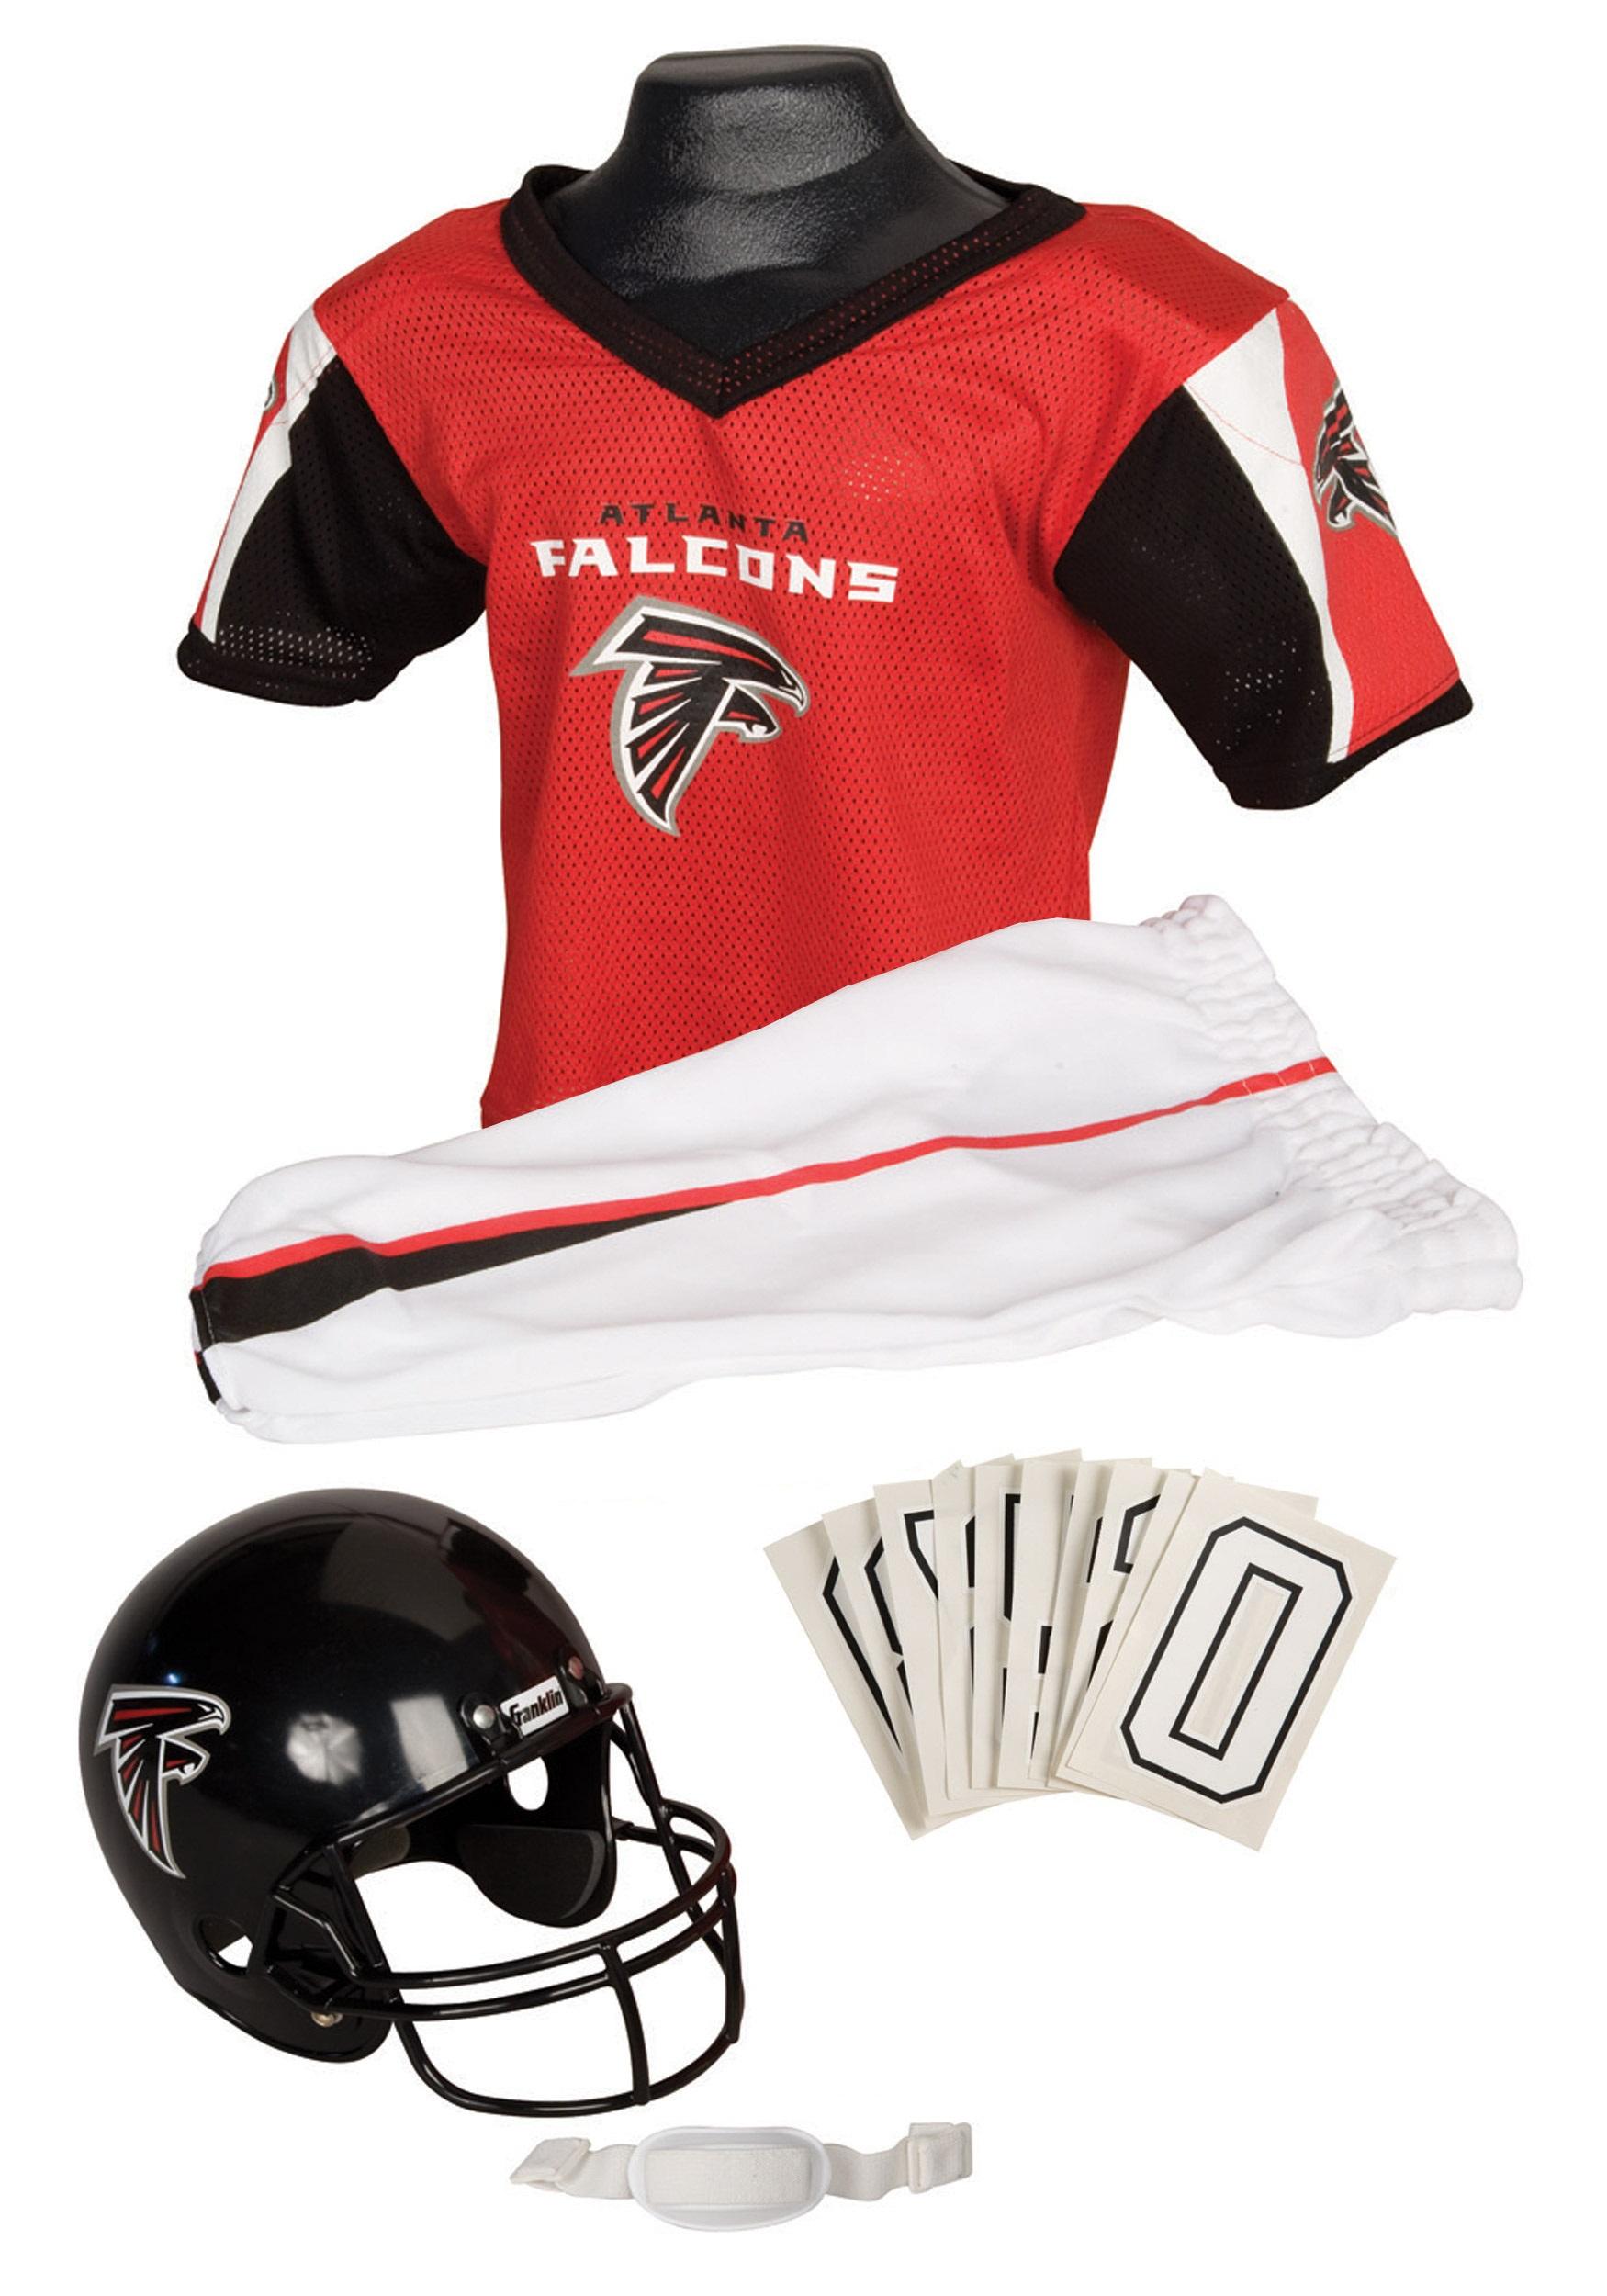 NFL Falcons Uniform Costume